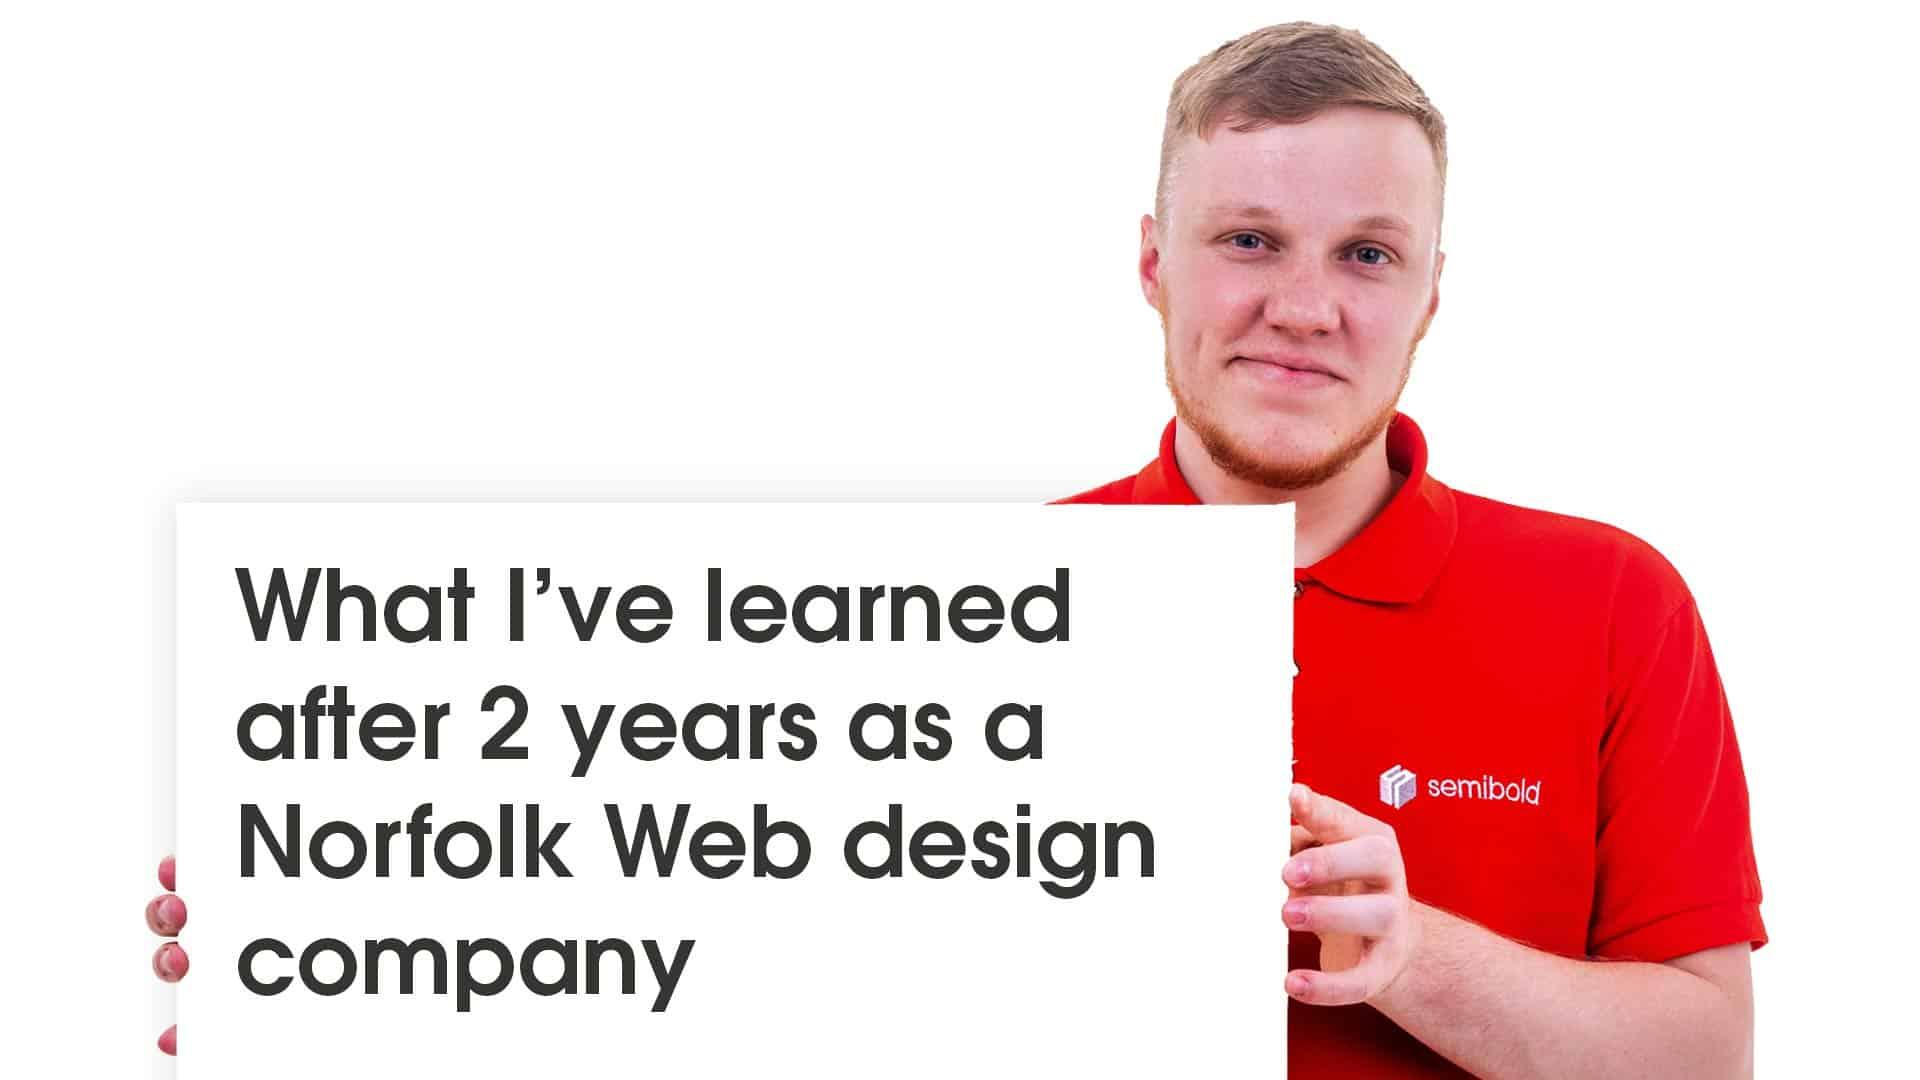 Norfolk Web Design Company Learnings